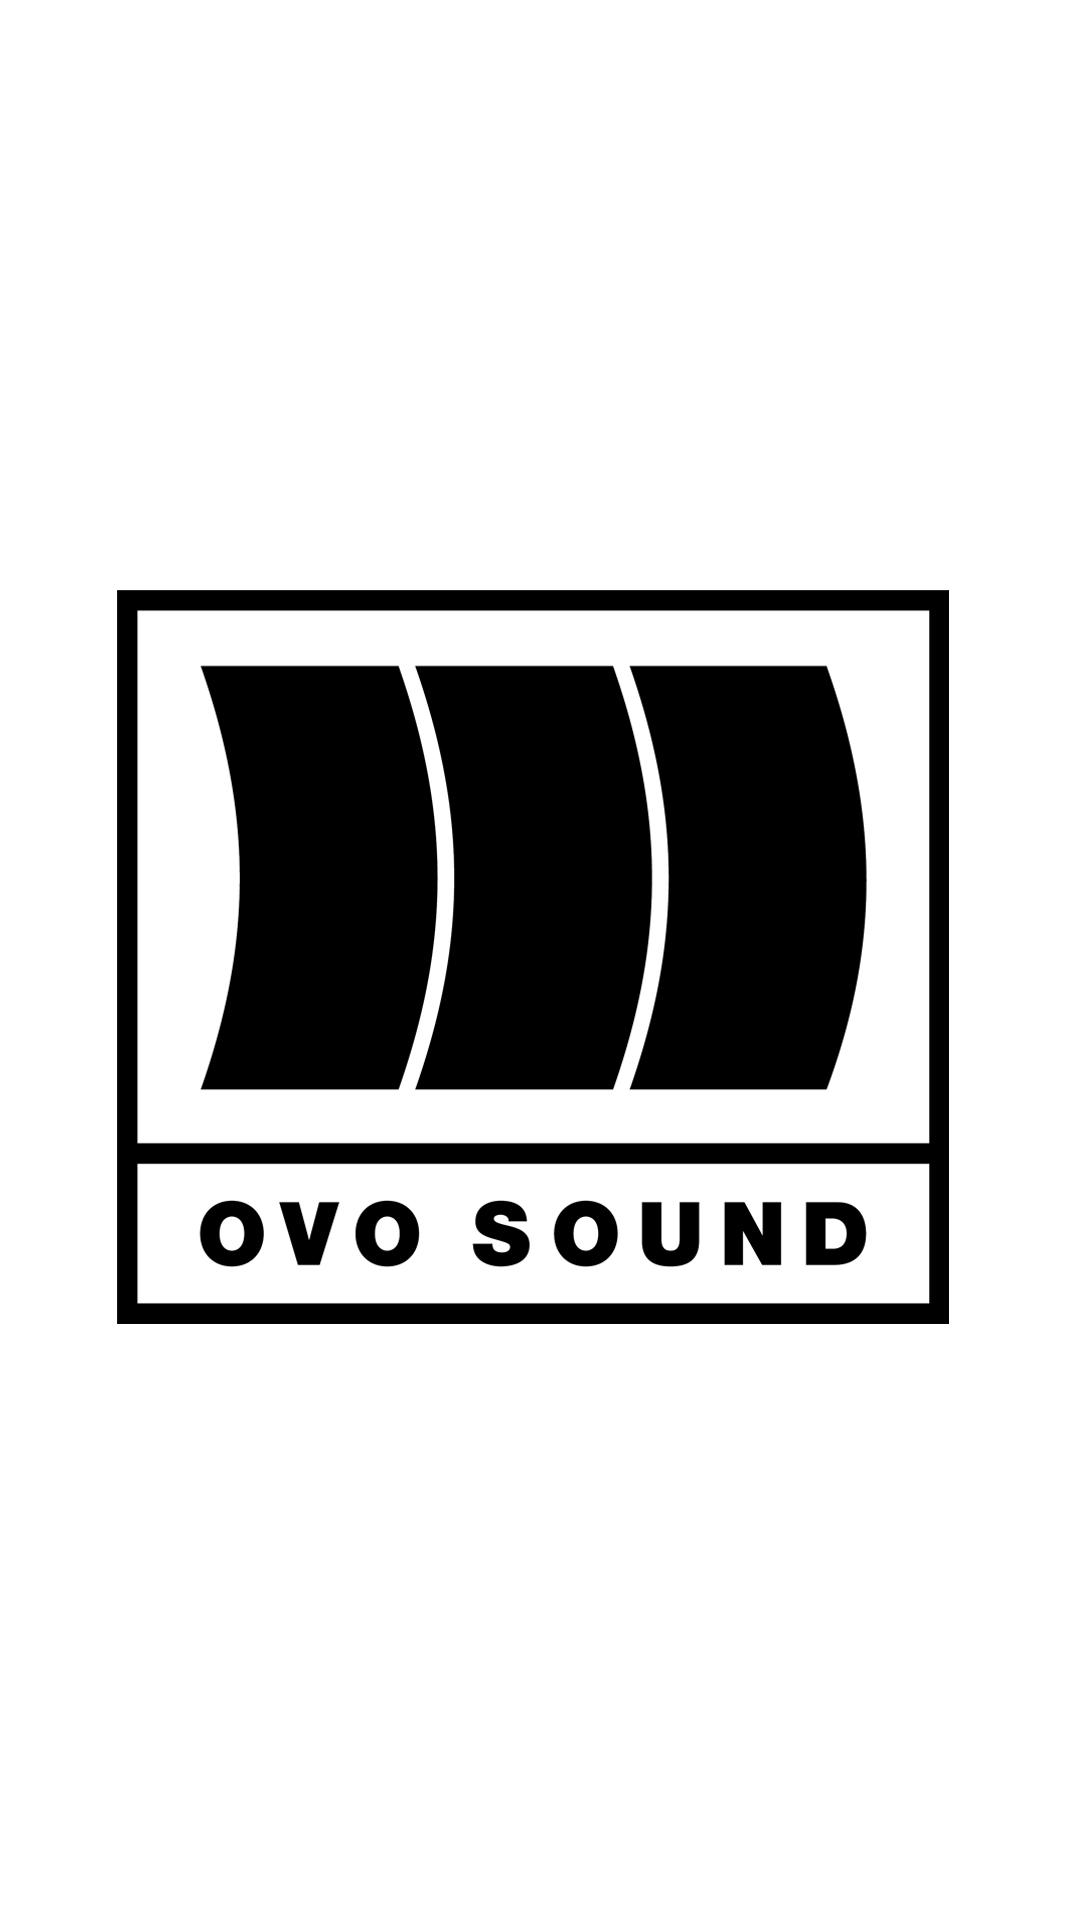 OVO Sound Phone wallpaper HD 1920x1080 by manbearpagan on ...